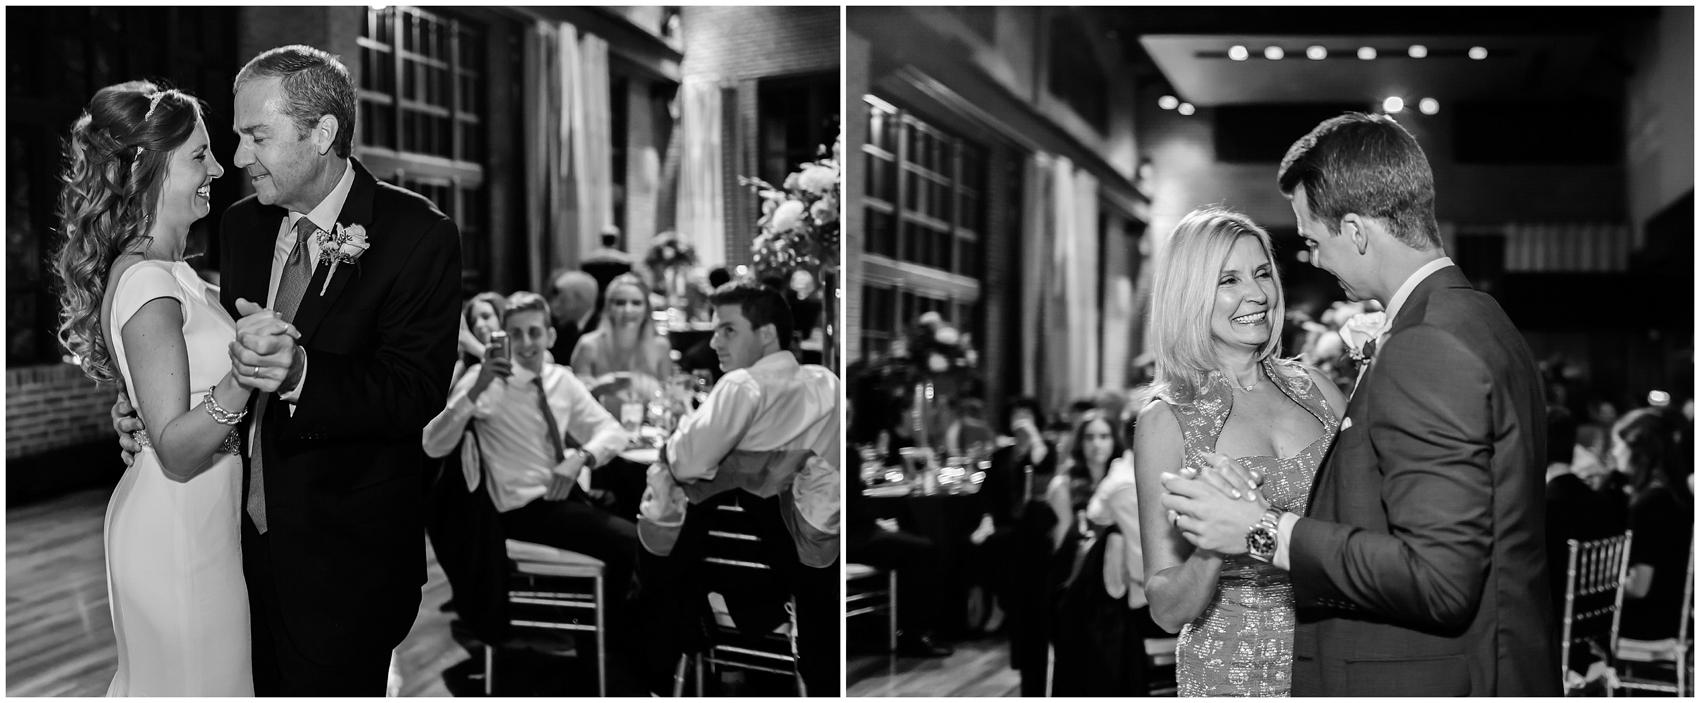 ritz-carlton-georgetown-wedding-washington-dc-photography-liz-stewart-photo-00047